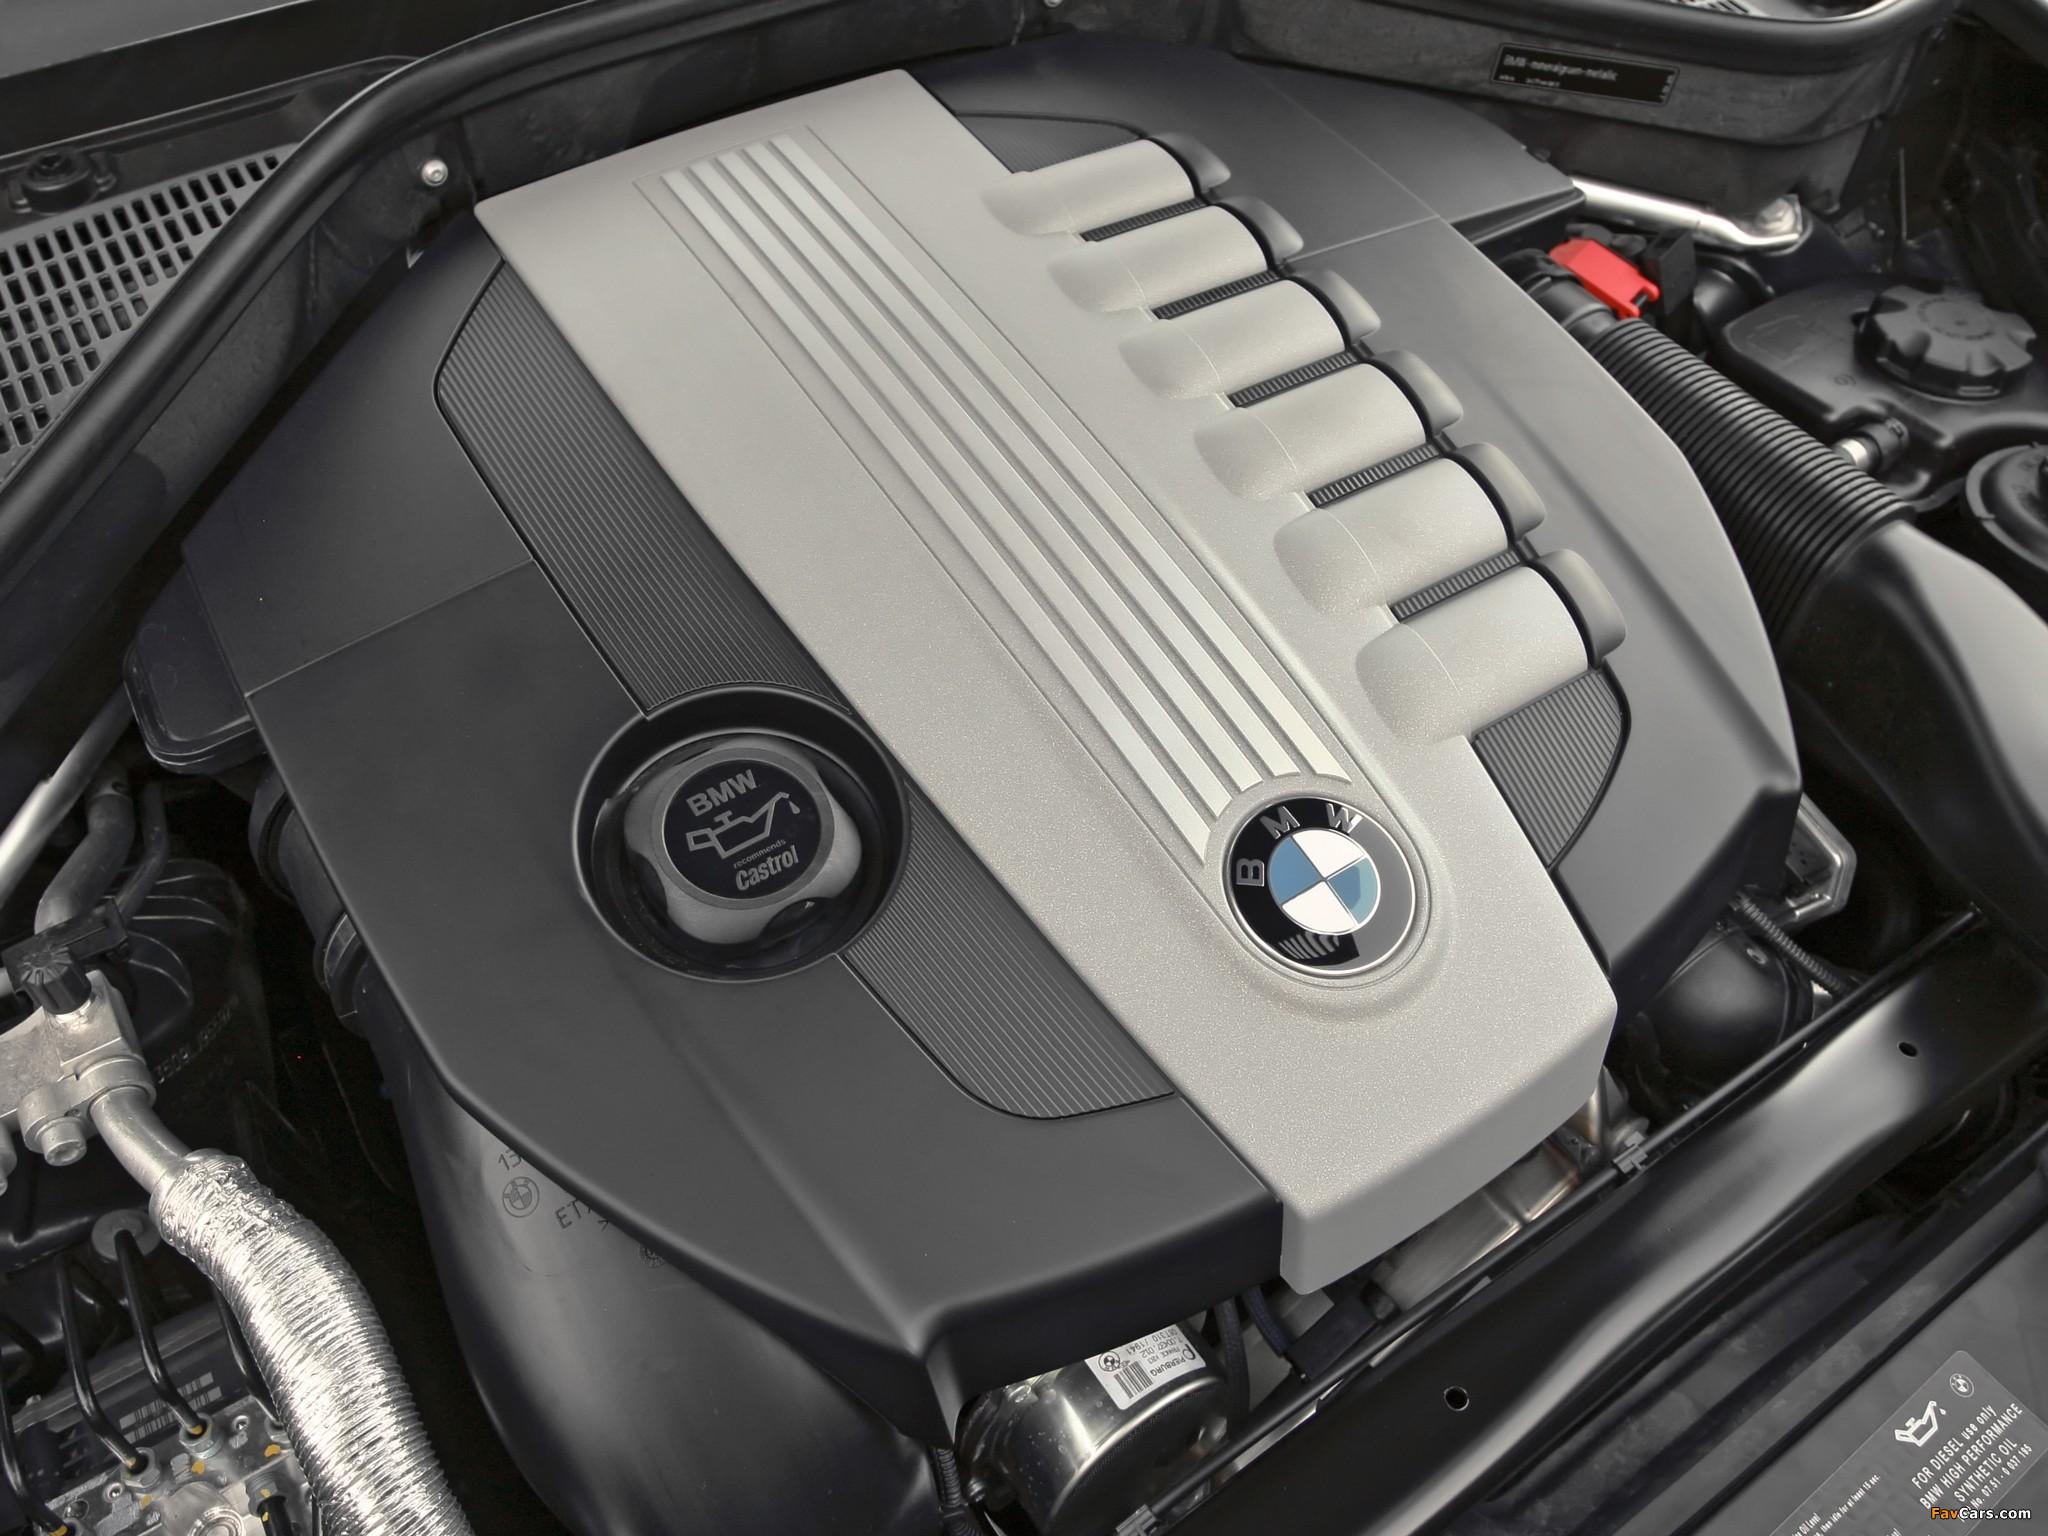 Bmw X5 Xdrive35d Blueperformance (50 Images) - New HD Car Wallpaper